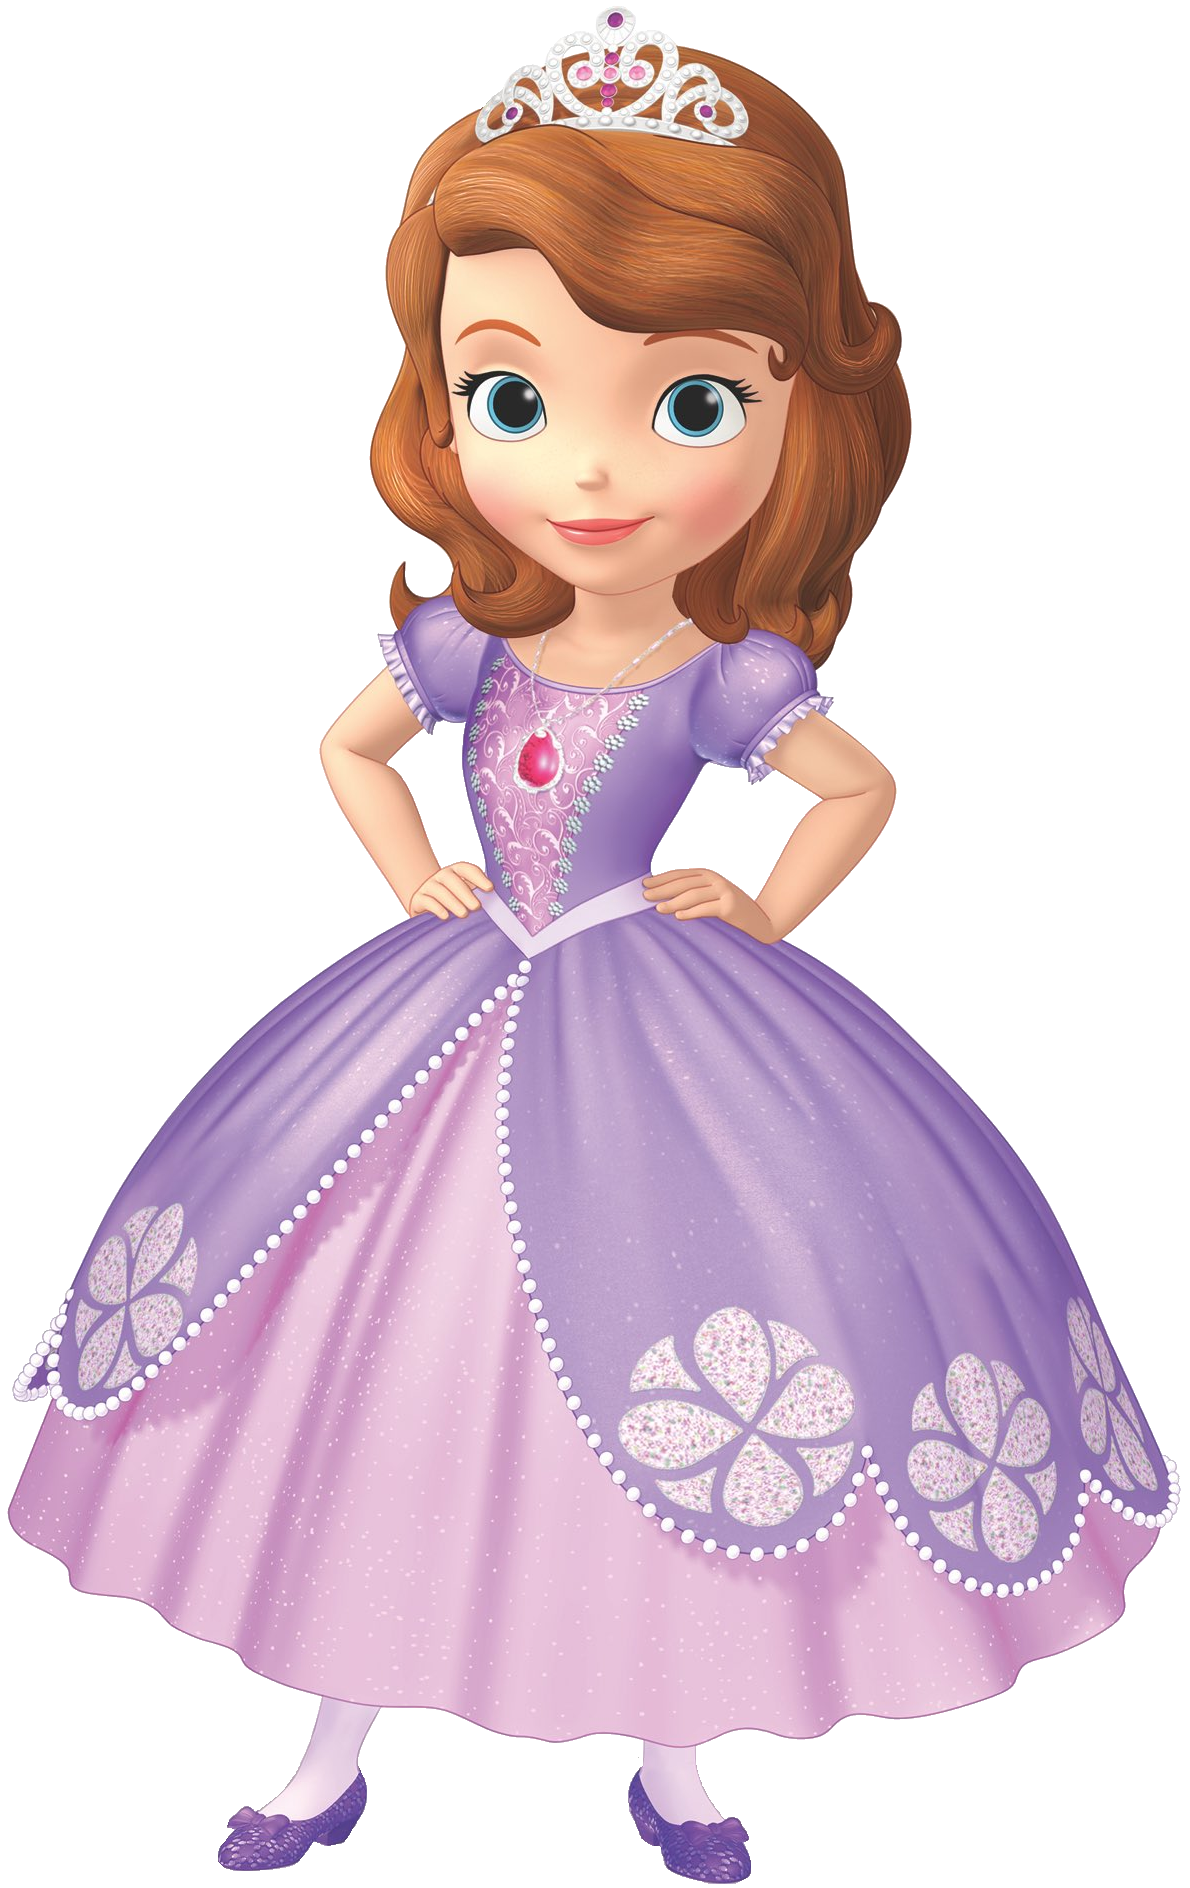 Princess Sofia The First Wiki FANDOM Powered By